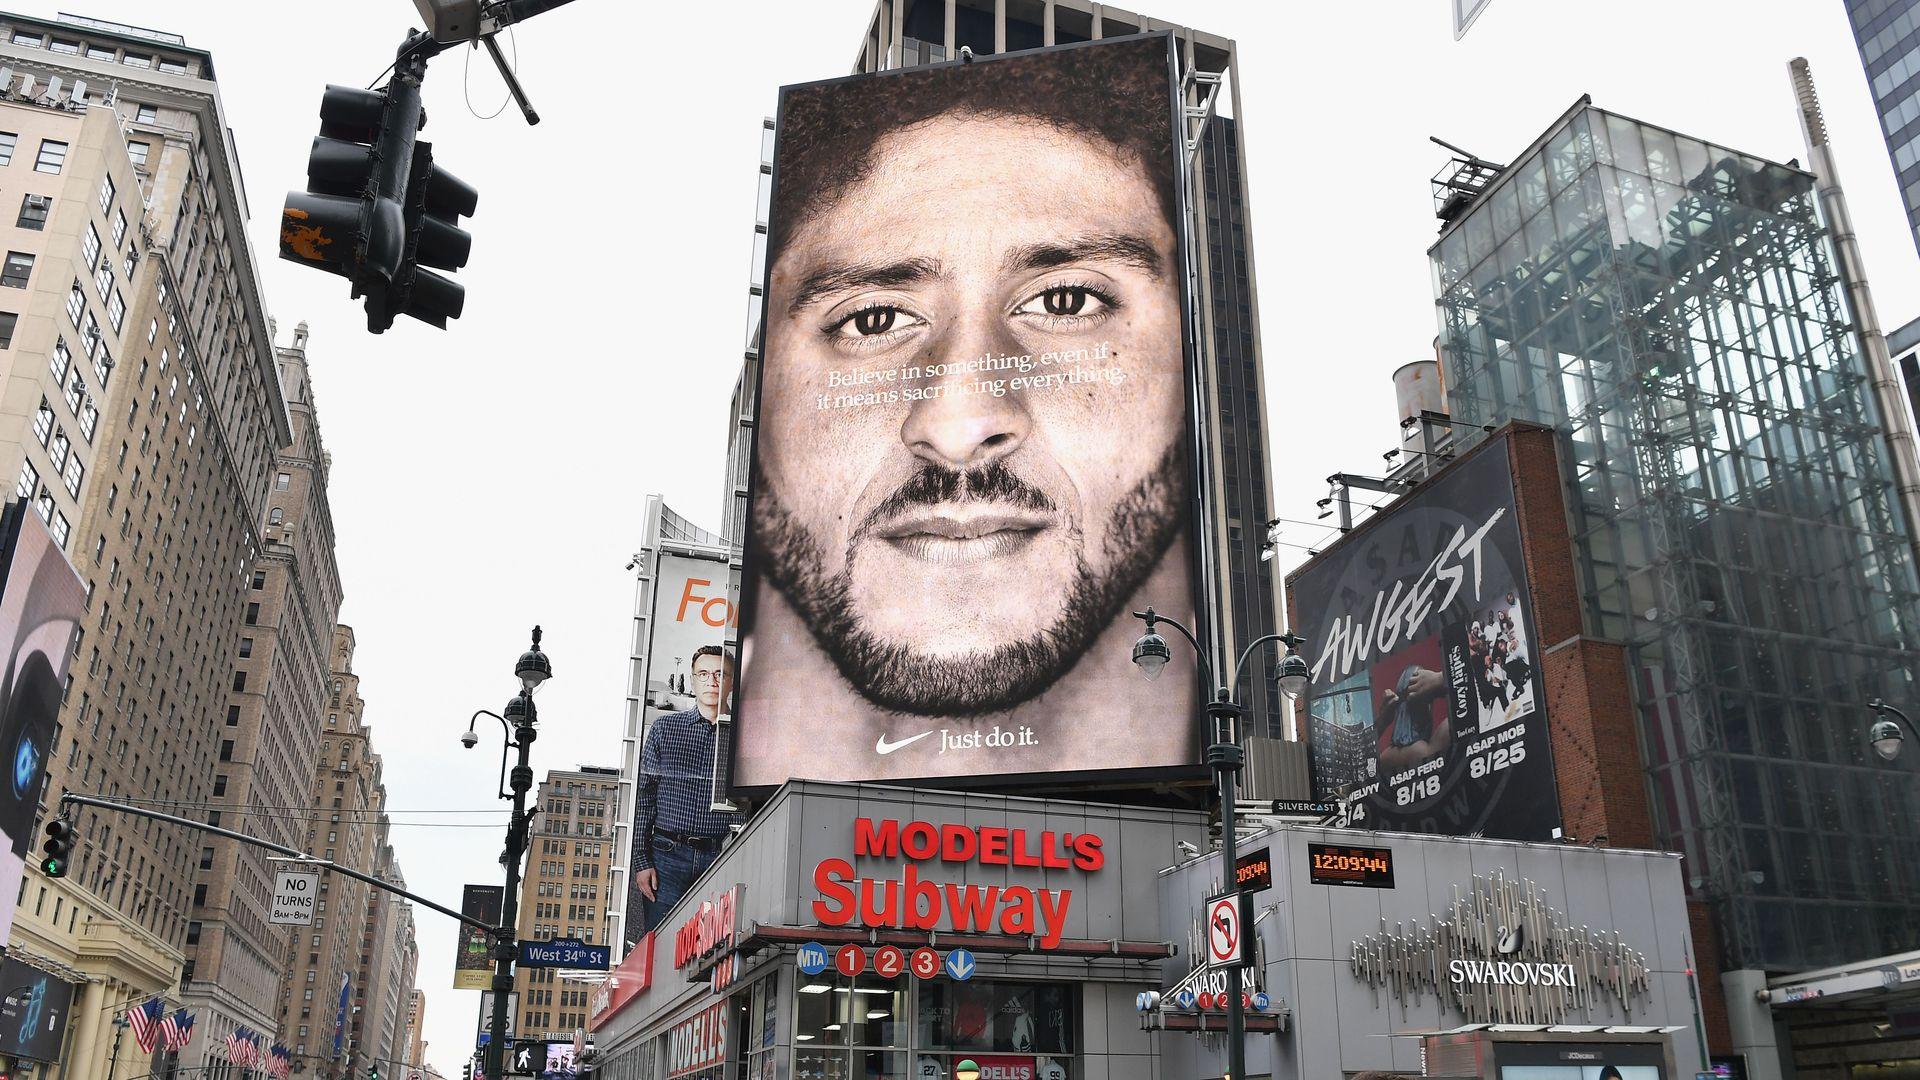 Colin Kaepernick's Nike billboard